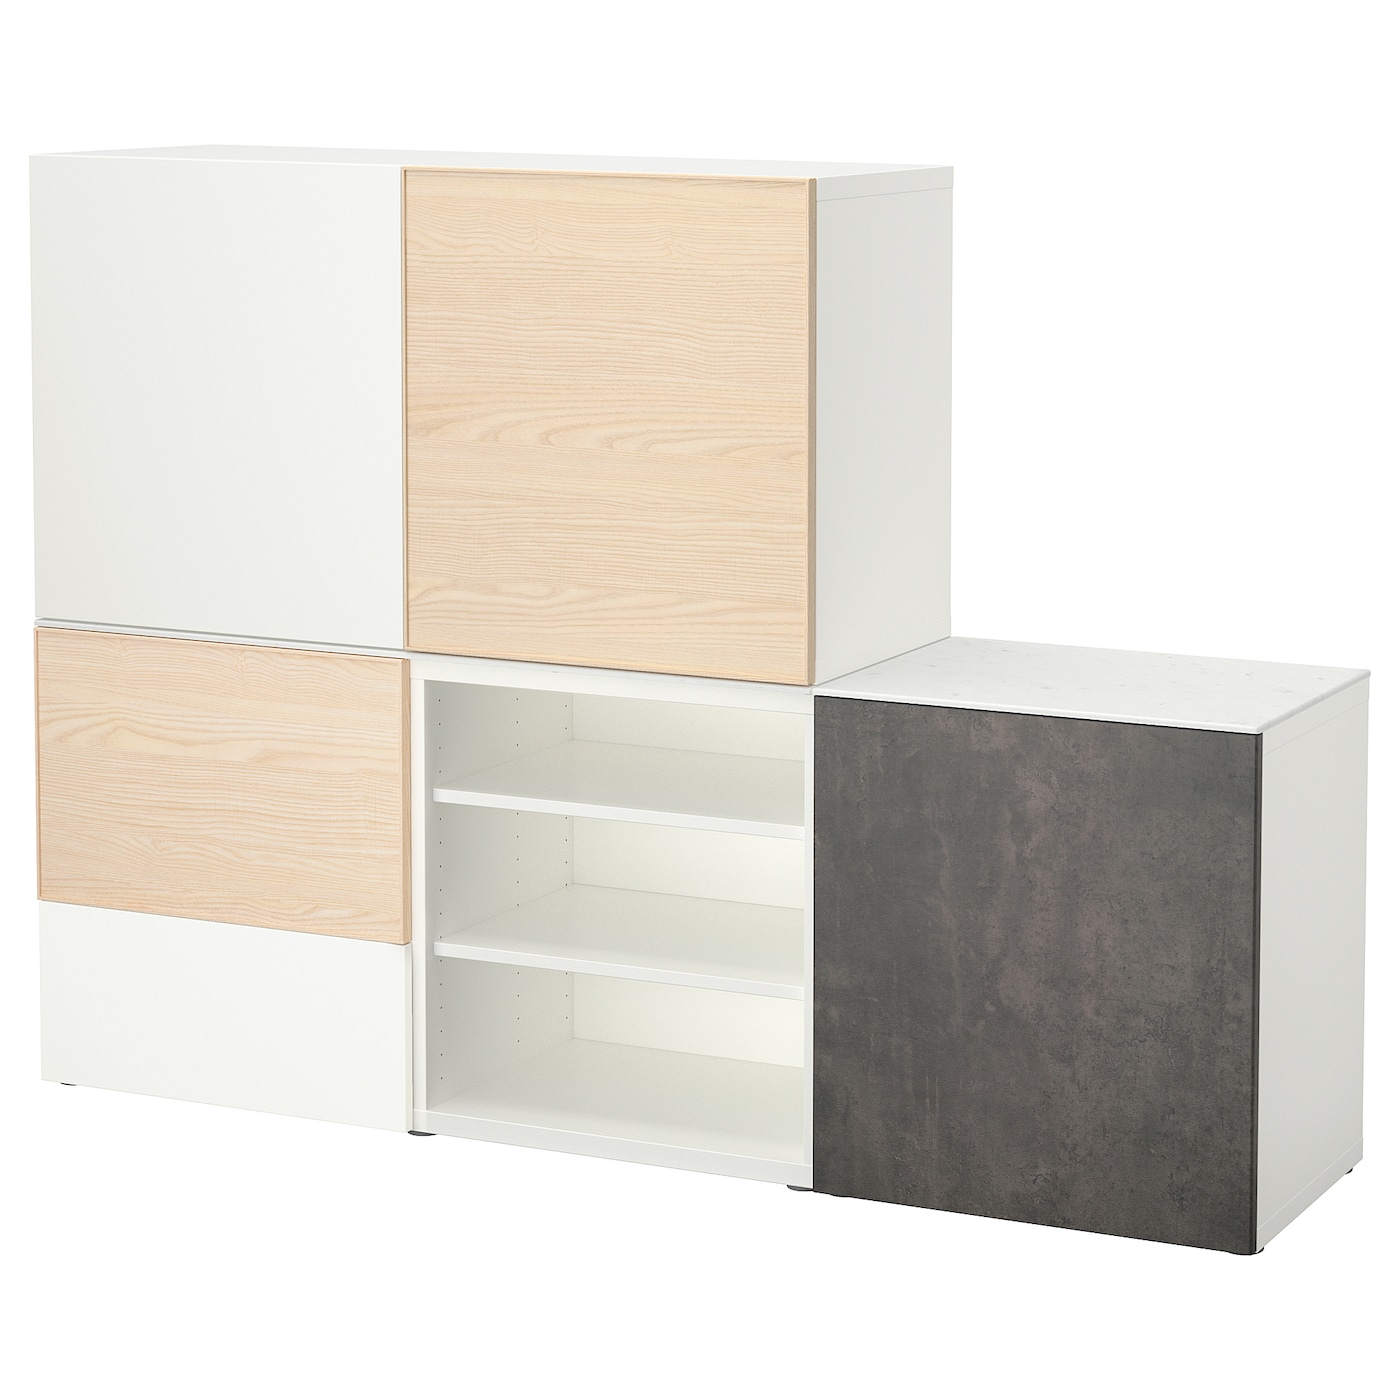 Ikea Besta Türen bestå aufbewkomb türen schubladen ikea